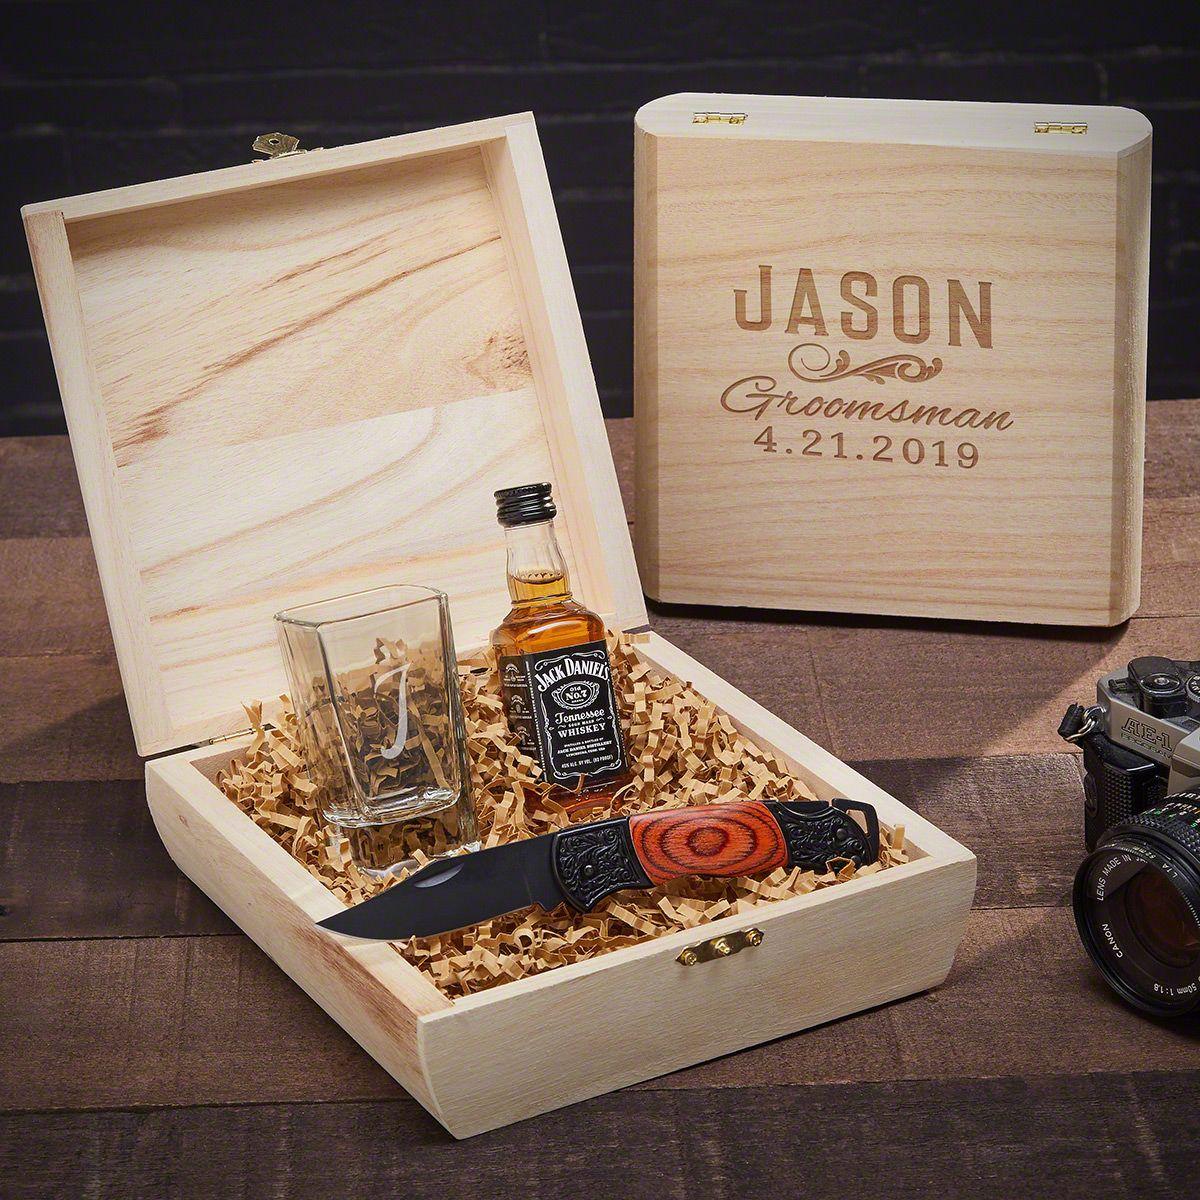 Classic Groomsman Double Shot Glass Personalized Gift Box